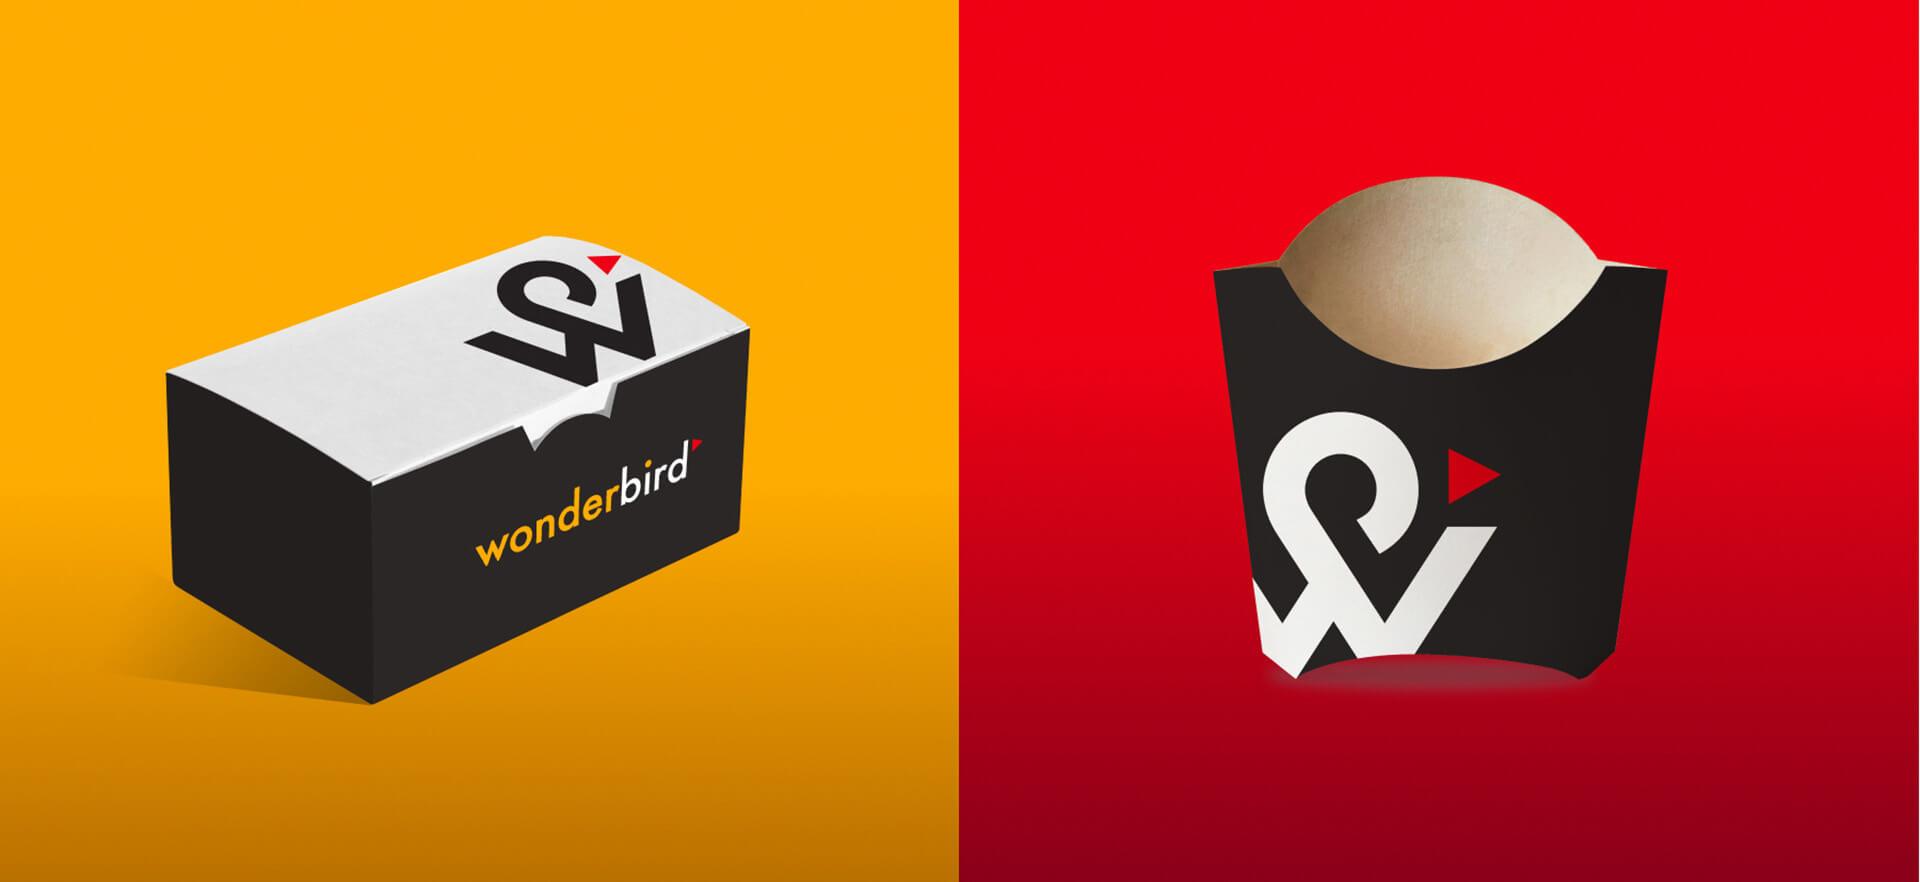 Wonderbird快餐品牌视觉w88手机官网平台首页